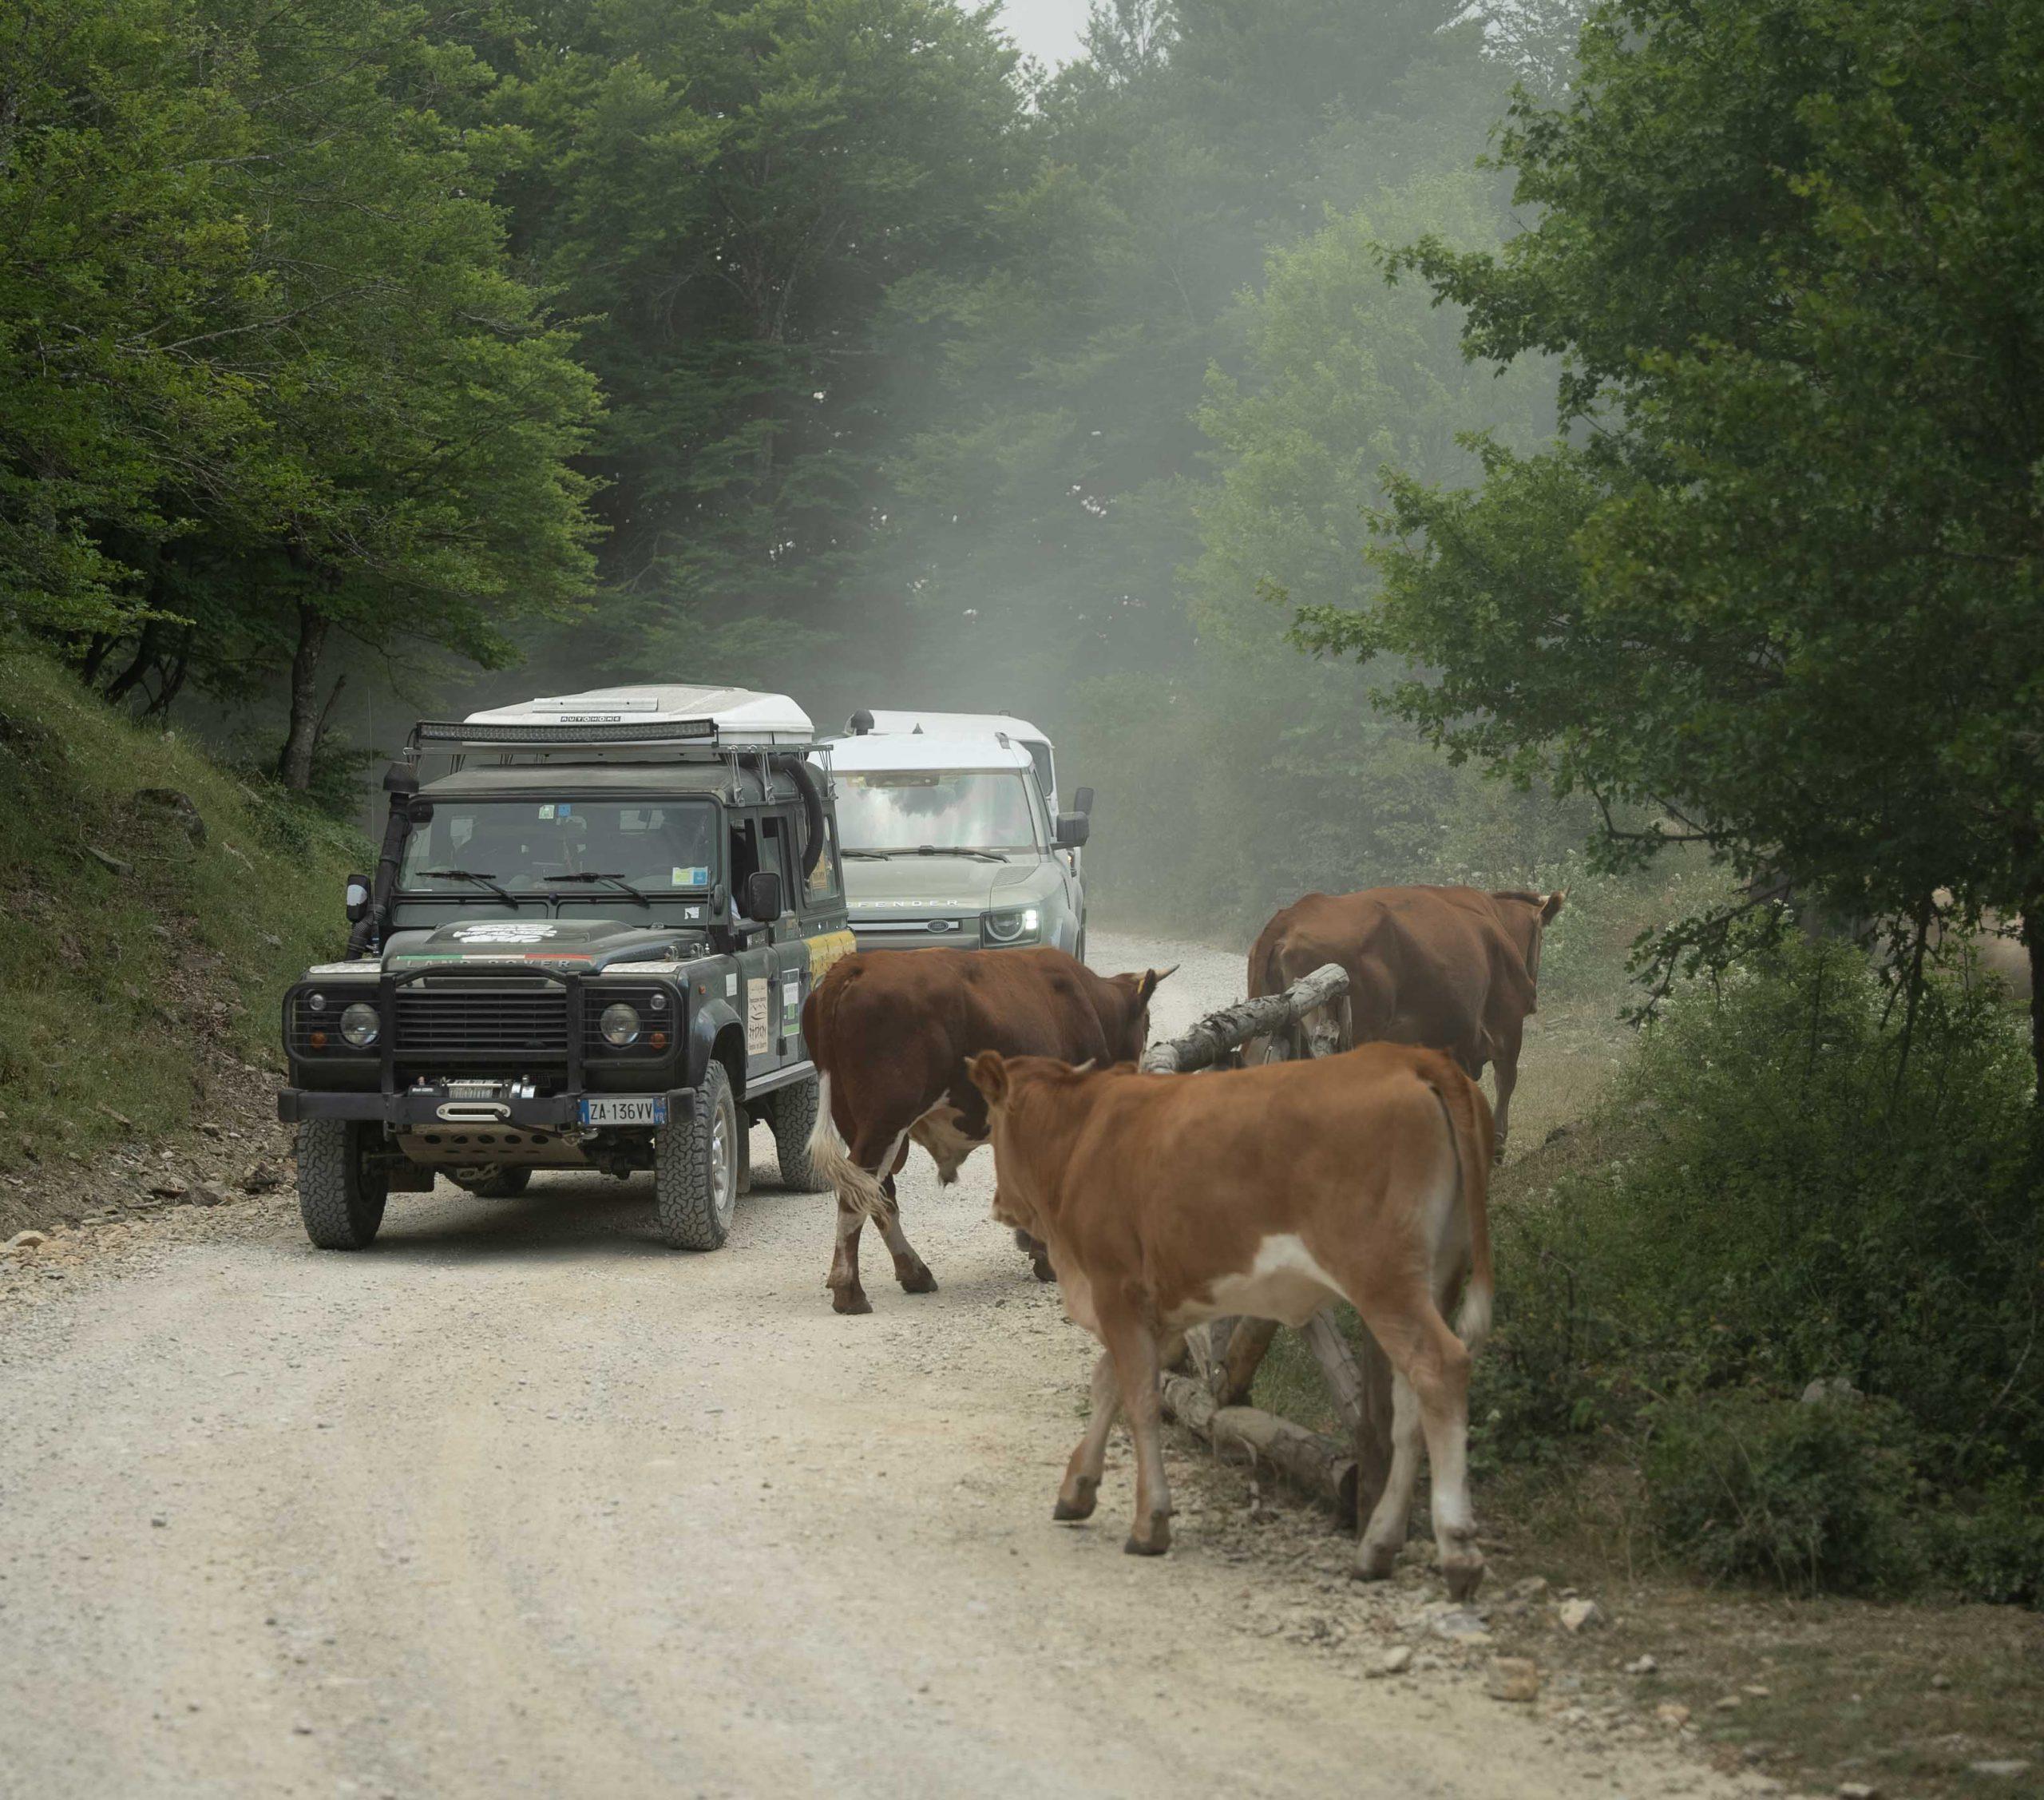 Land_Rover_Tour_Sicilia_2021_Land_Rover_Experience_Italia_-64